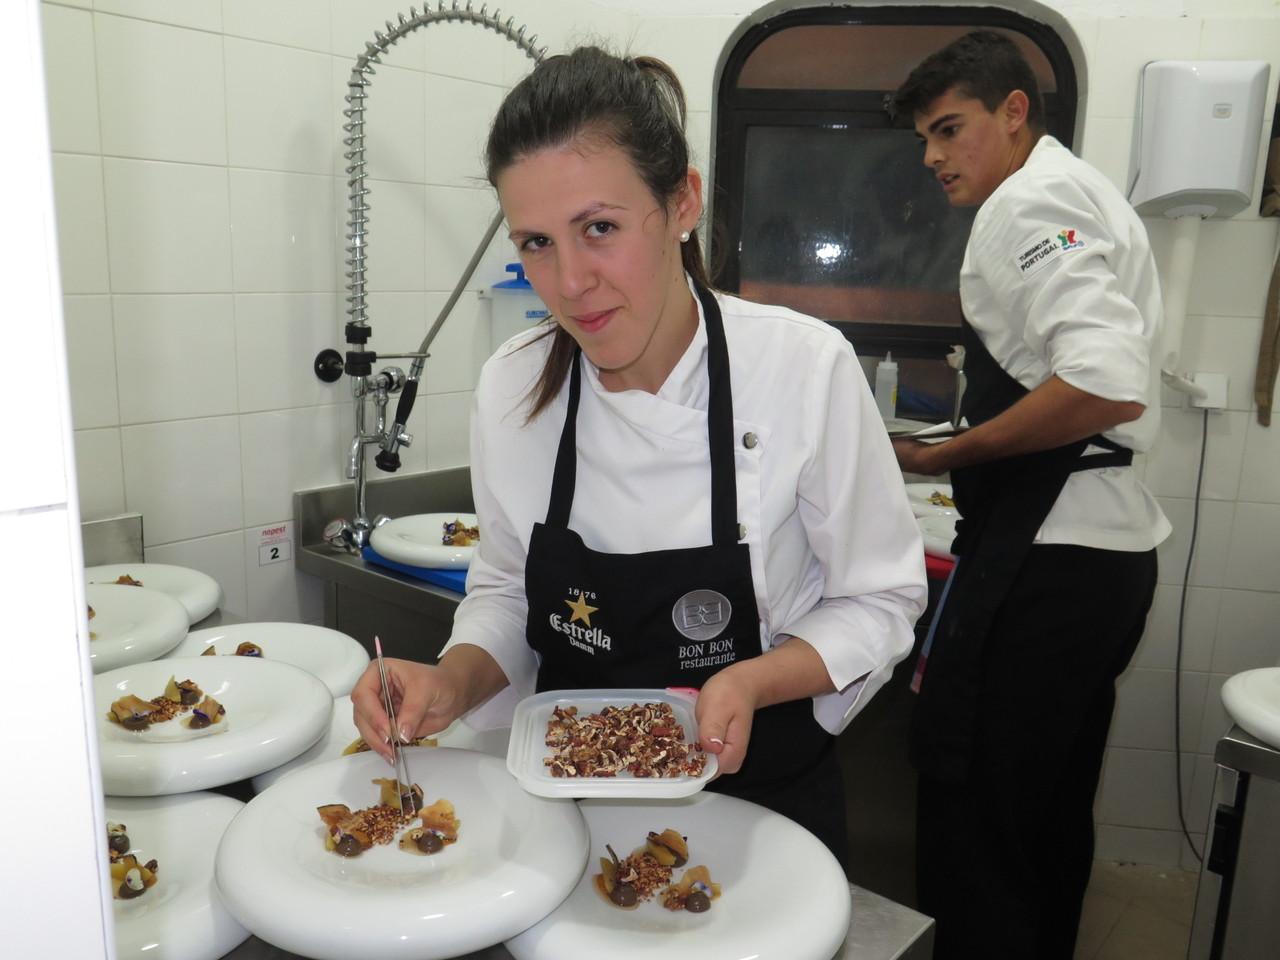 Nadia Carrasco e a Noz Pecan